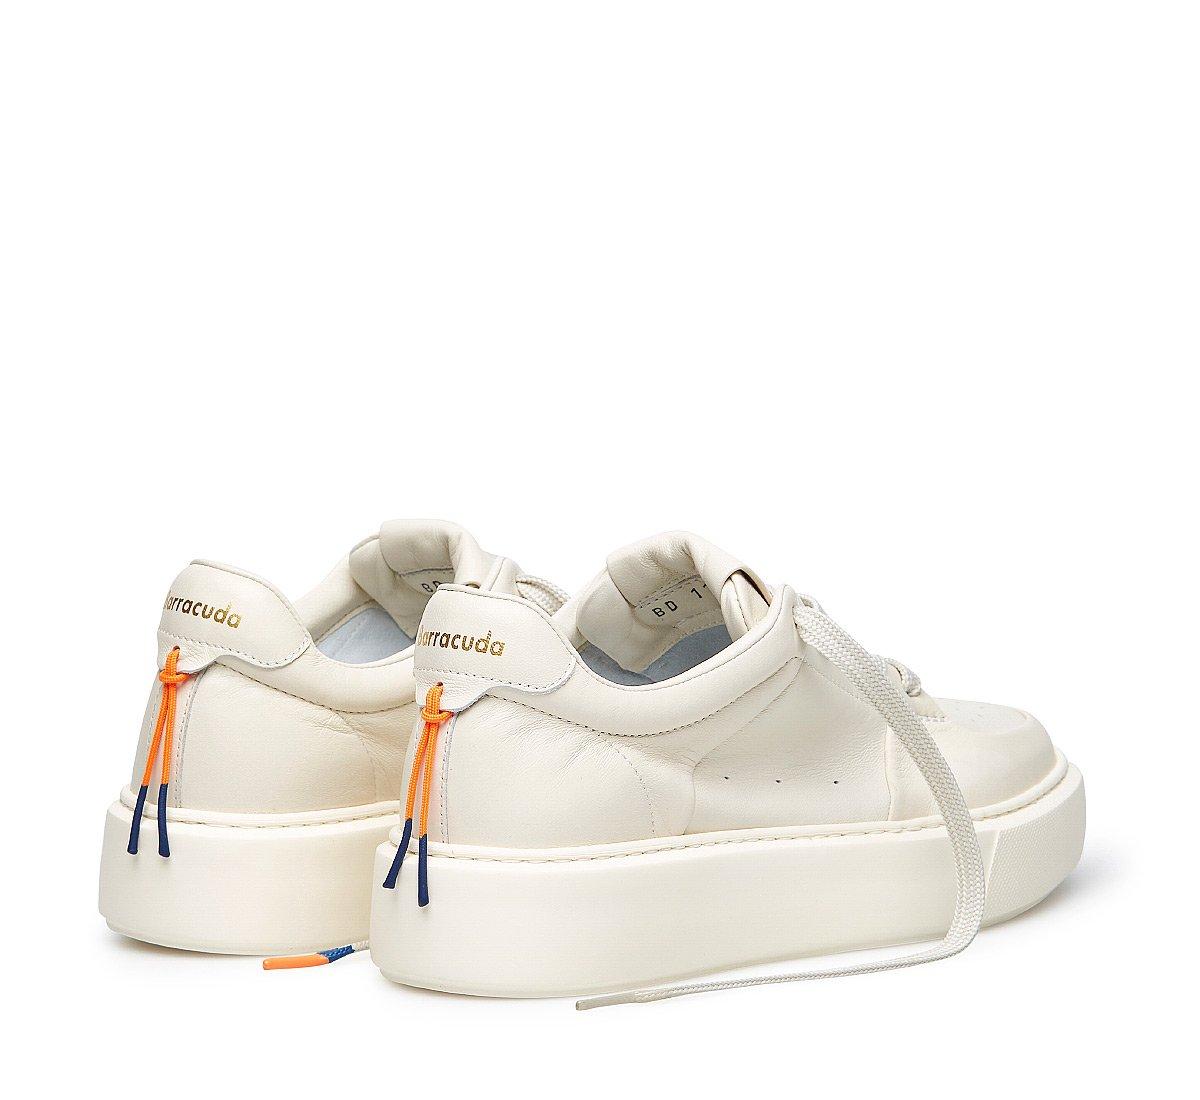 JIMBO sneakers